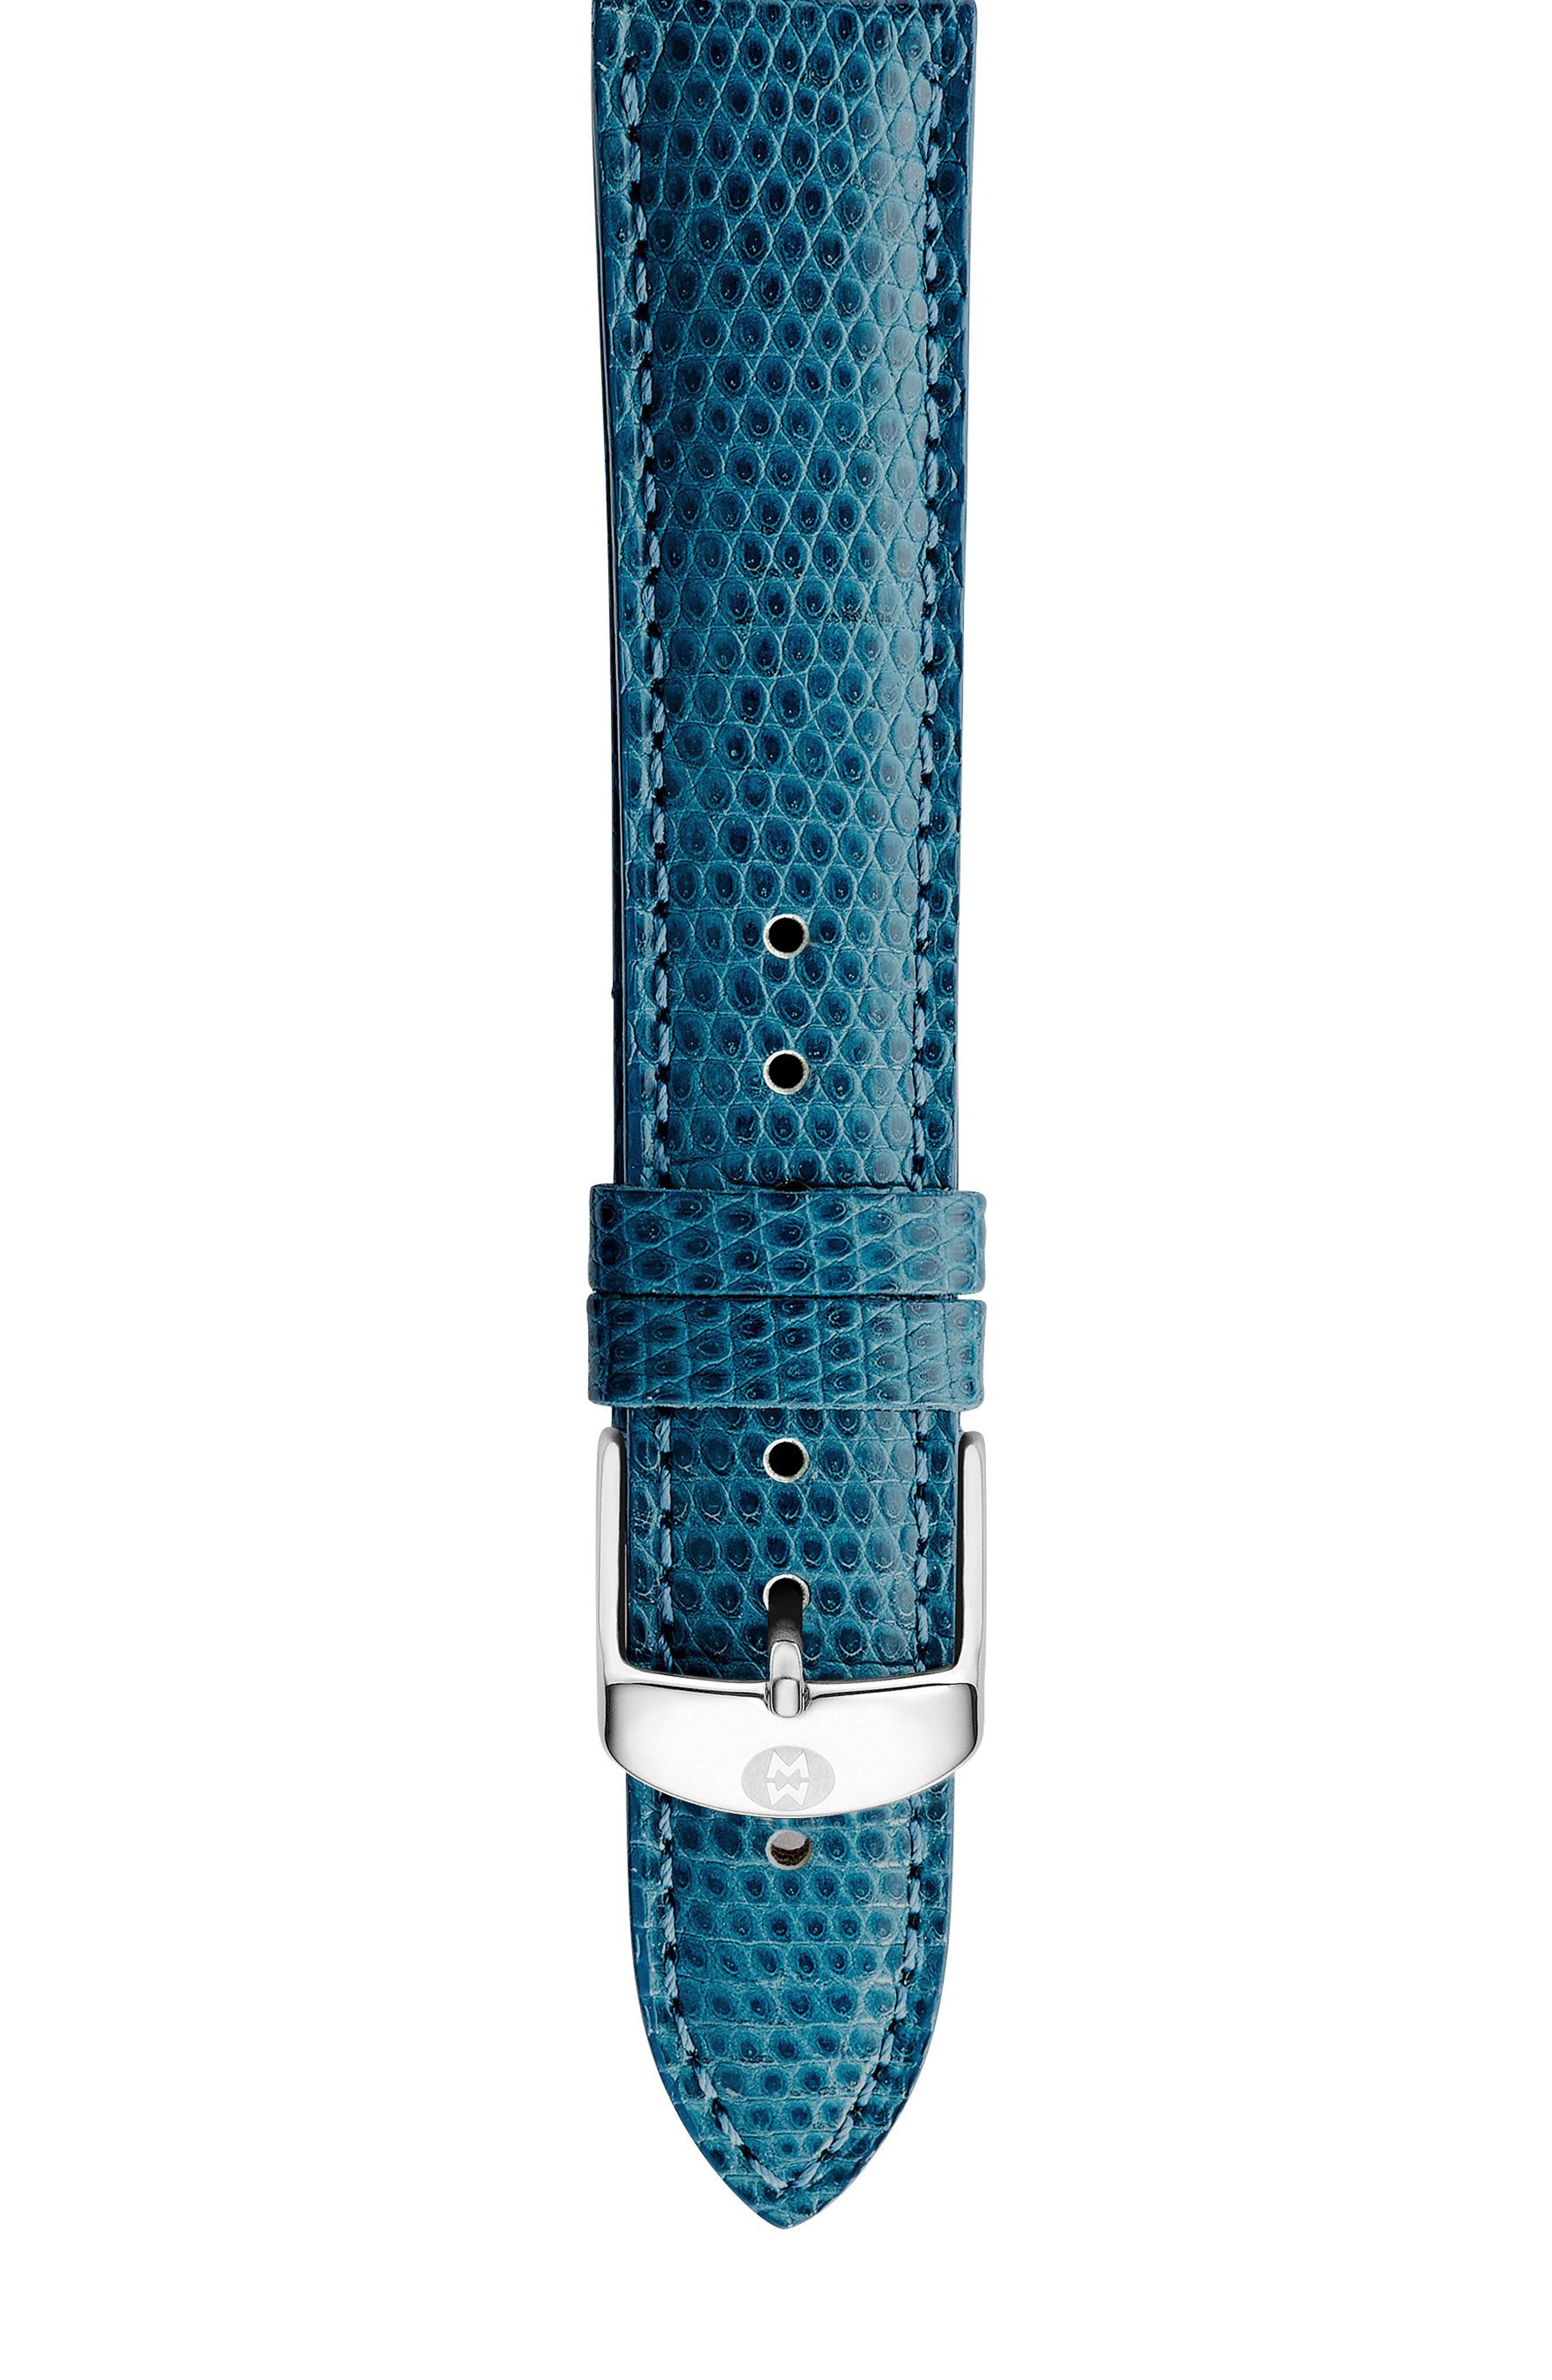 18mm Lizardskin Watch Strap,                         Main,                         color, Blue